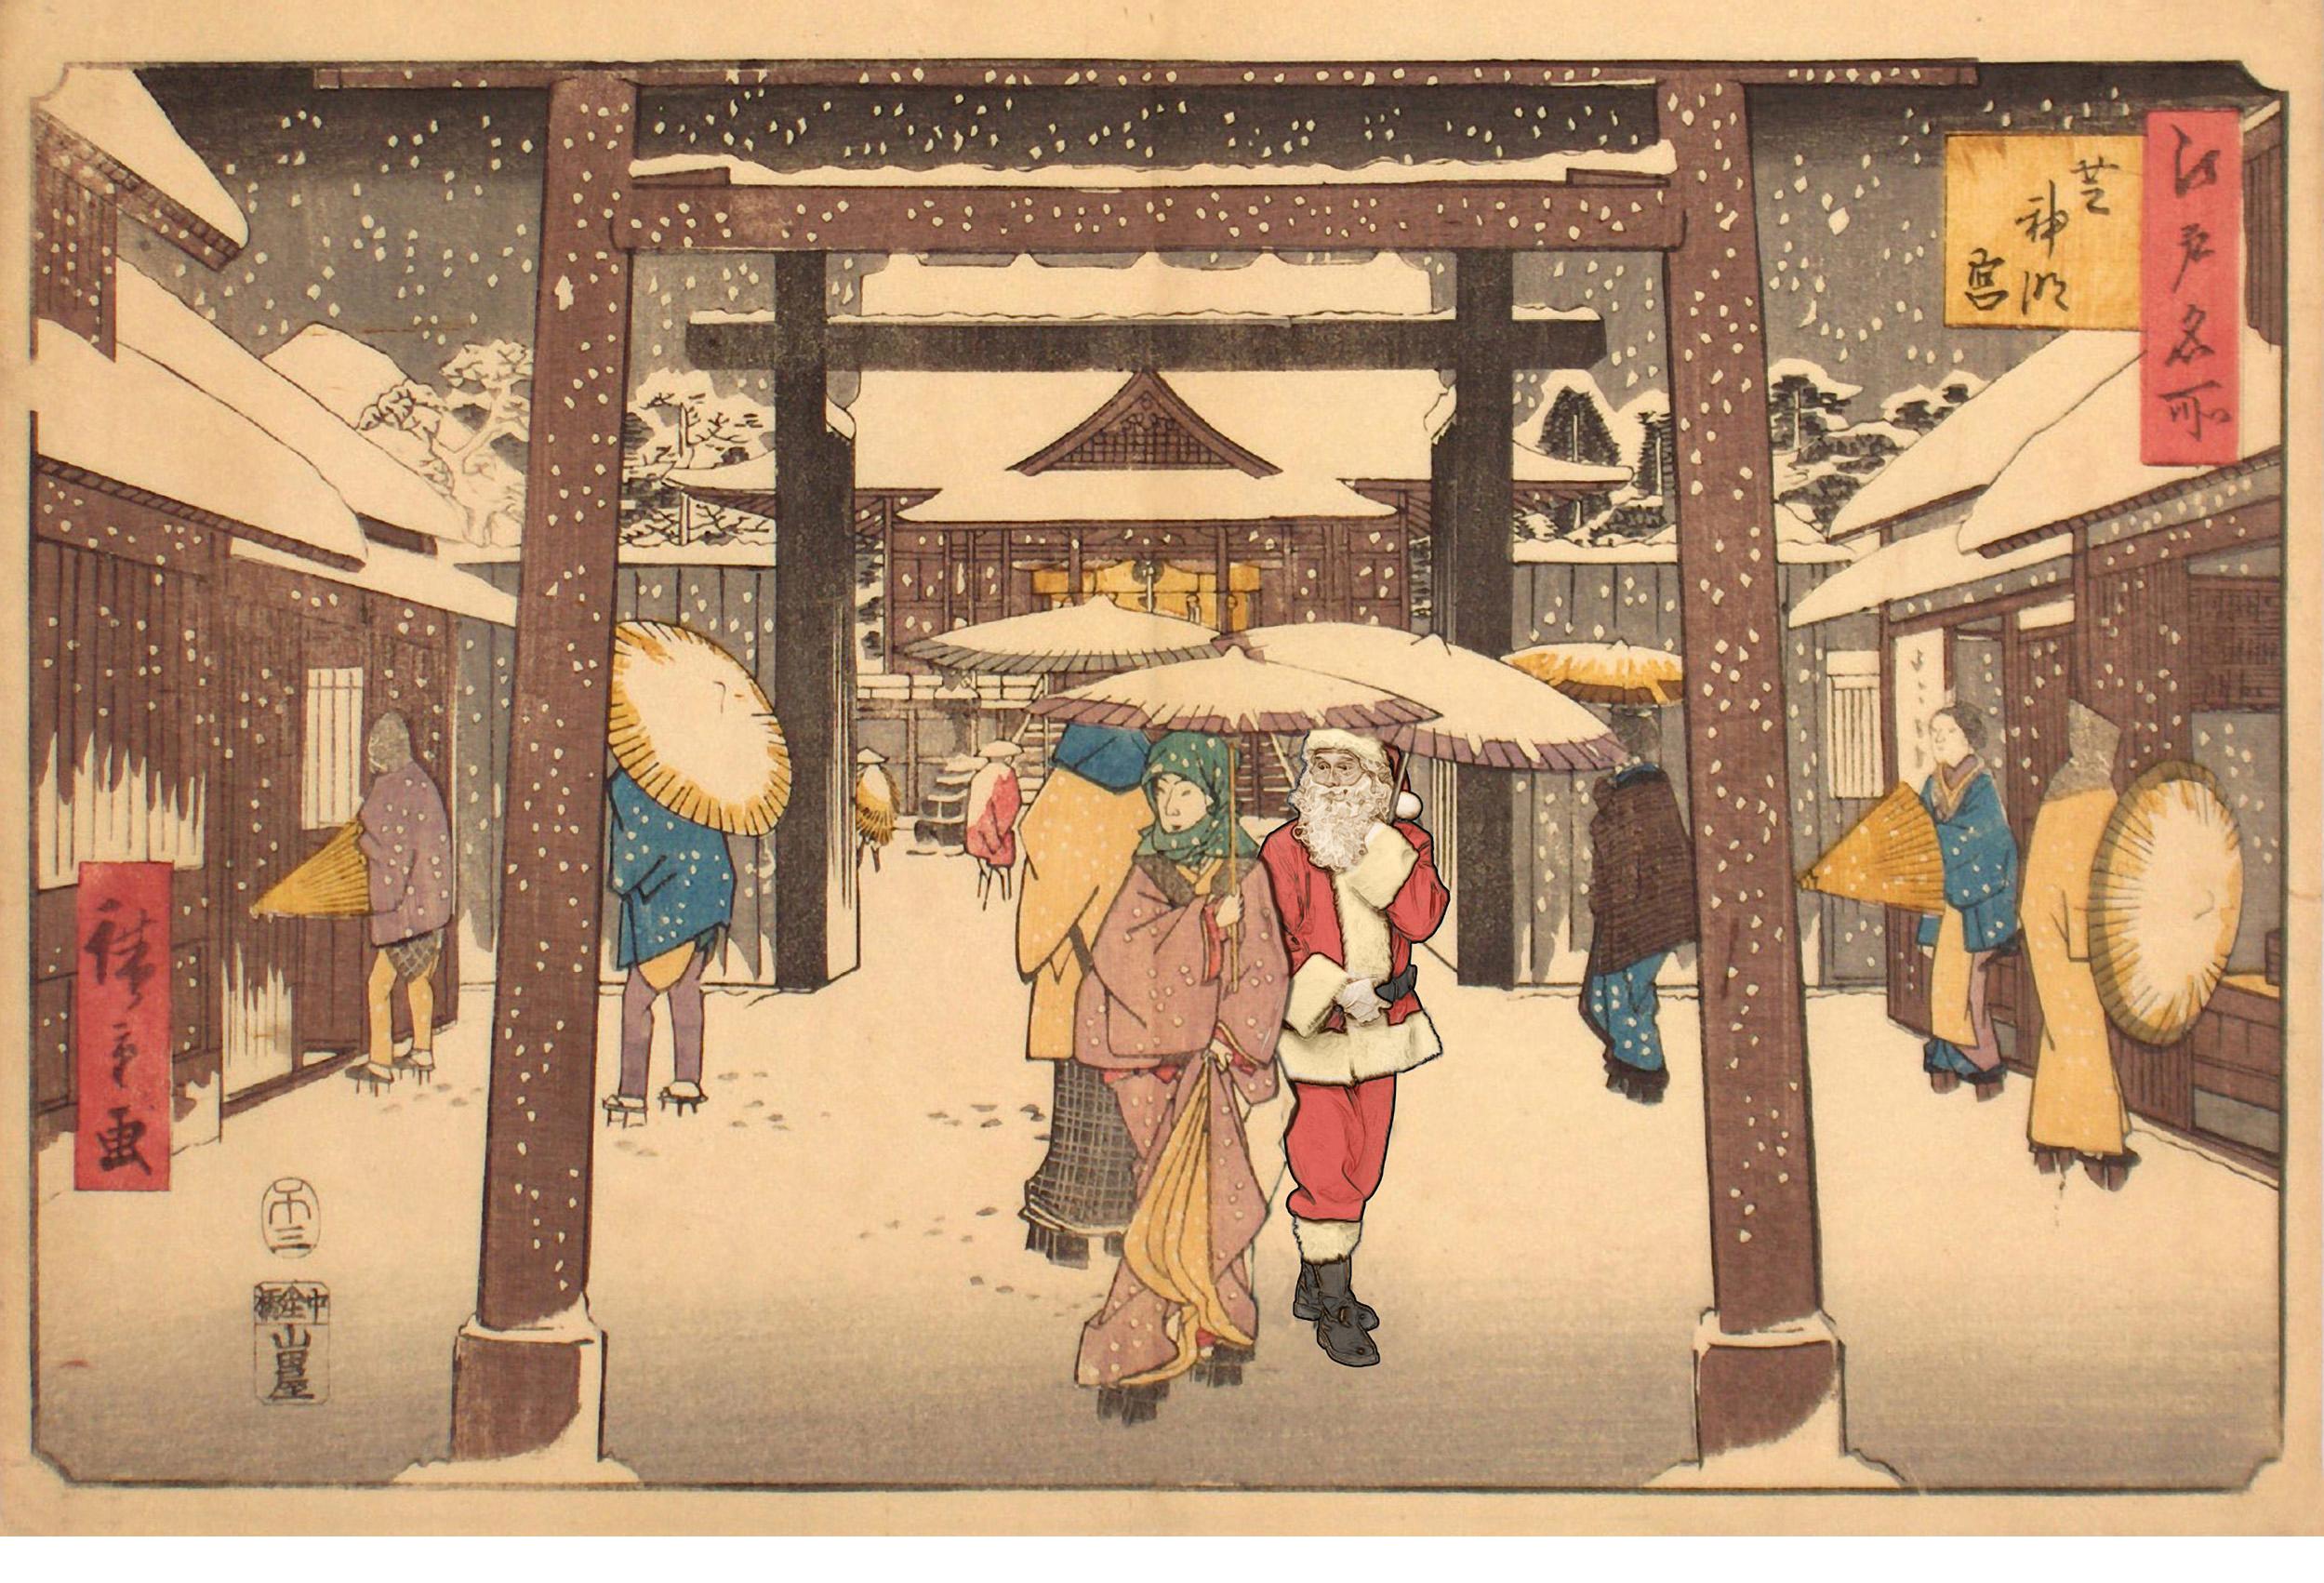 Heavy snow and visitors <br> to the Shiba Jingu Palace